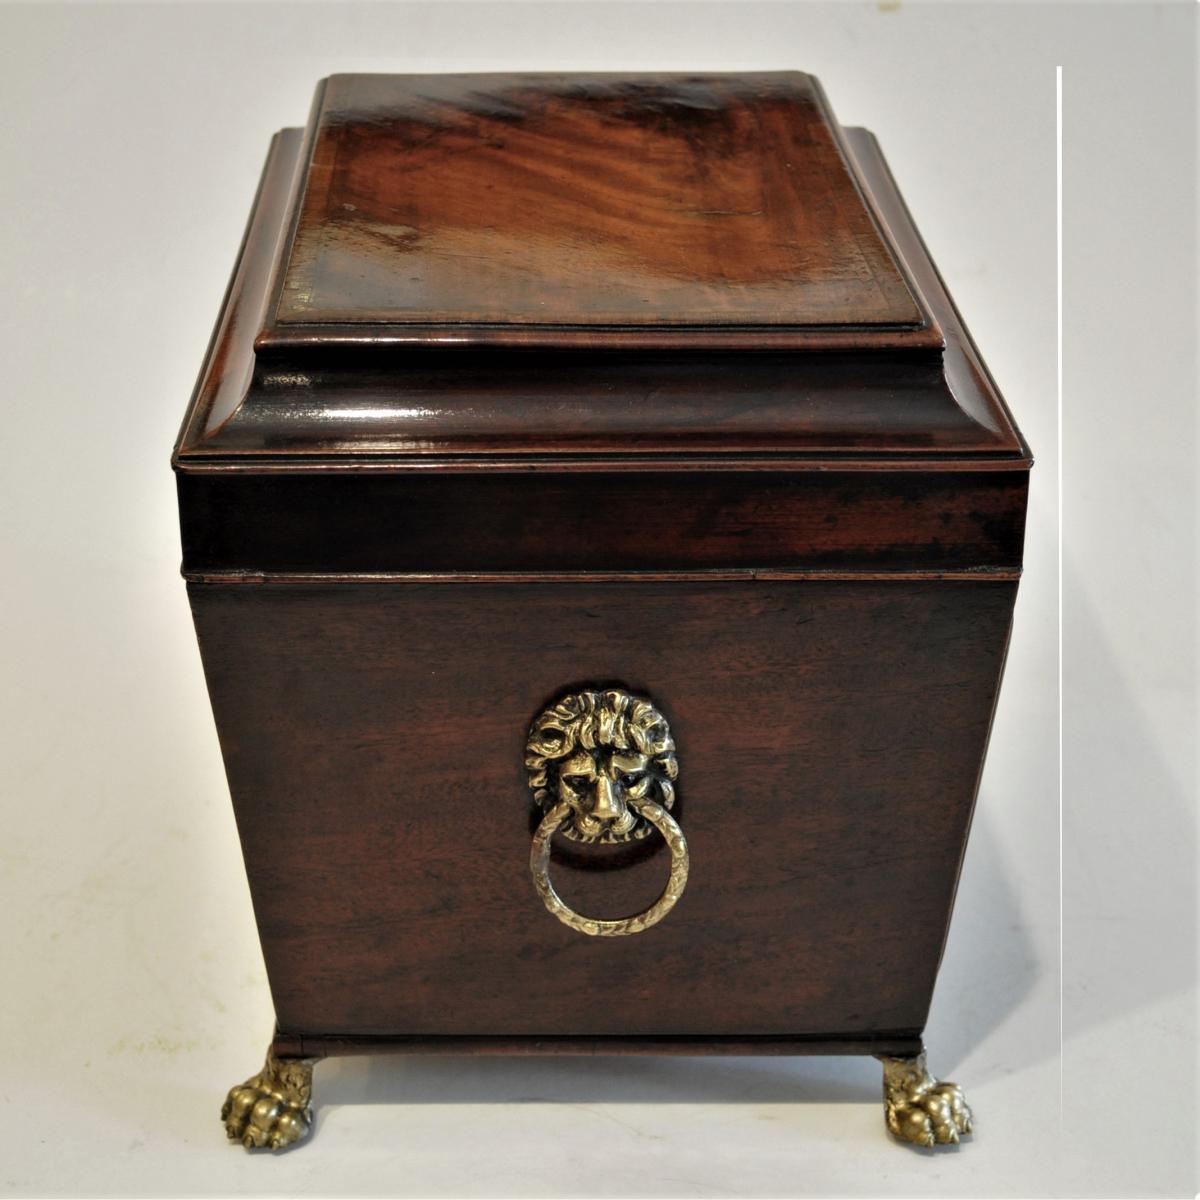 Regency former Decanter Box